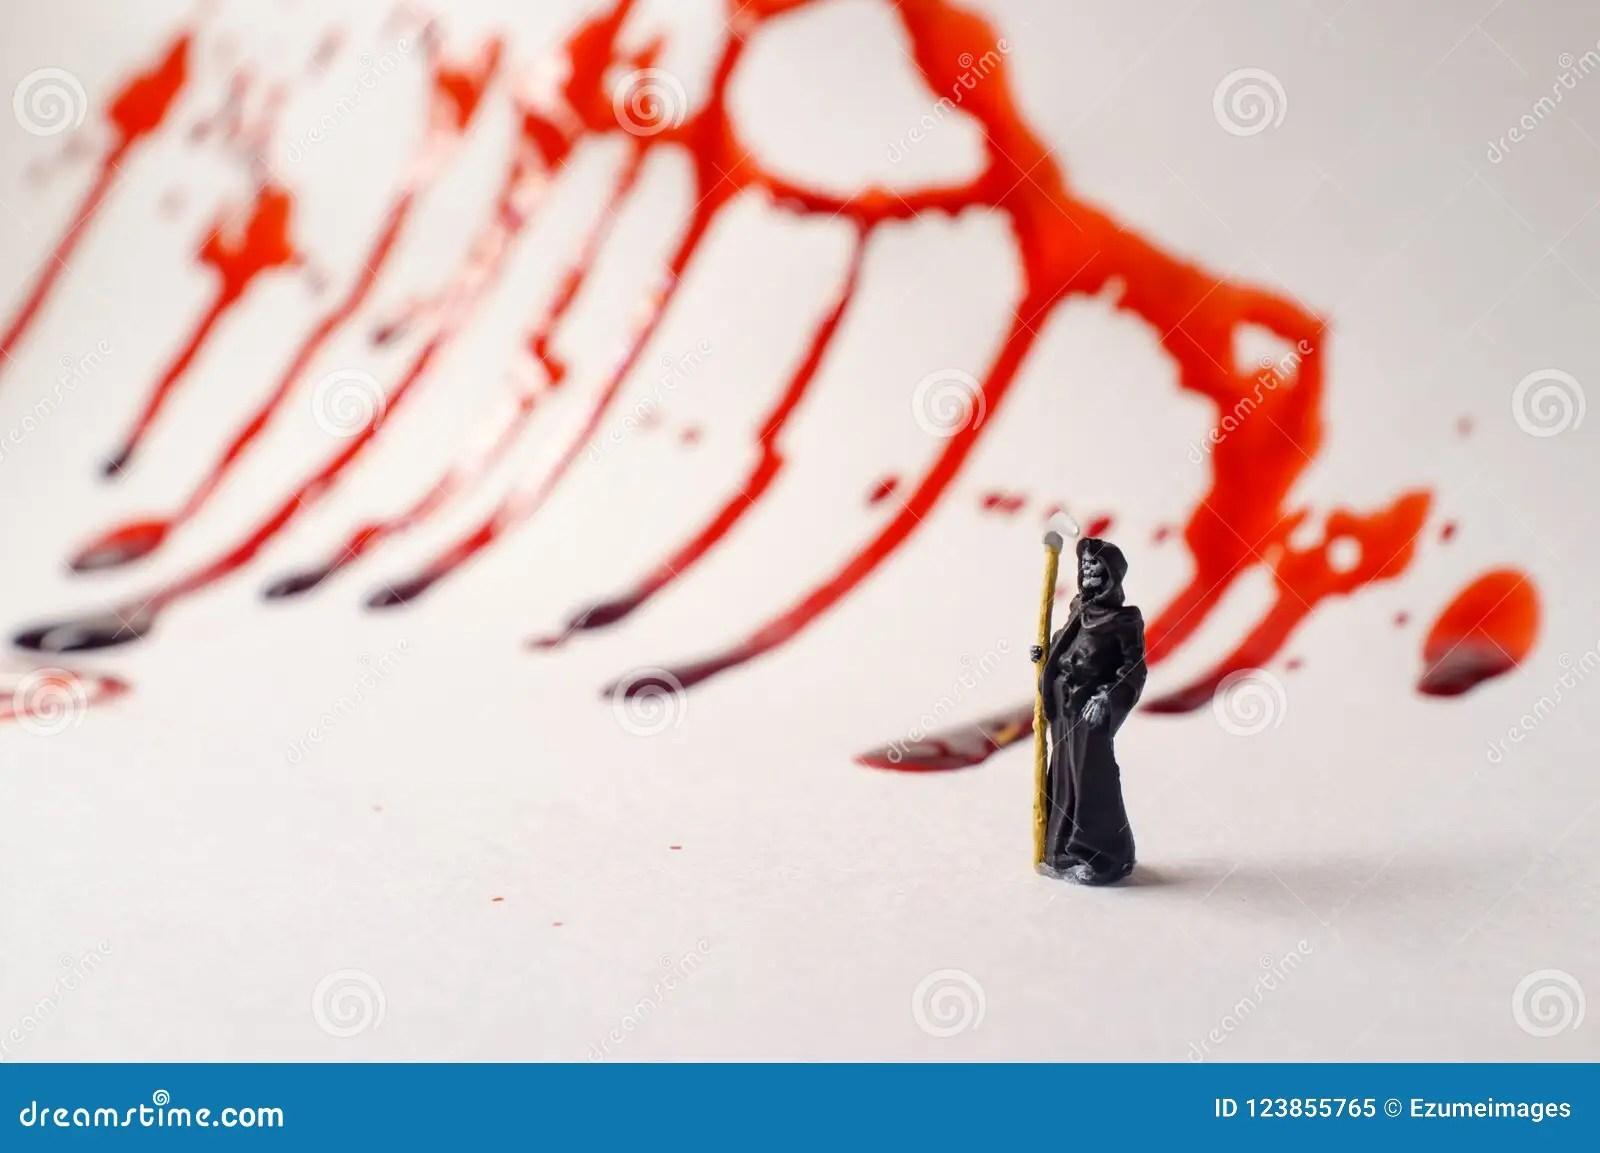 Grim Reaper Blood Splatter Stock Image Image Of Demon